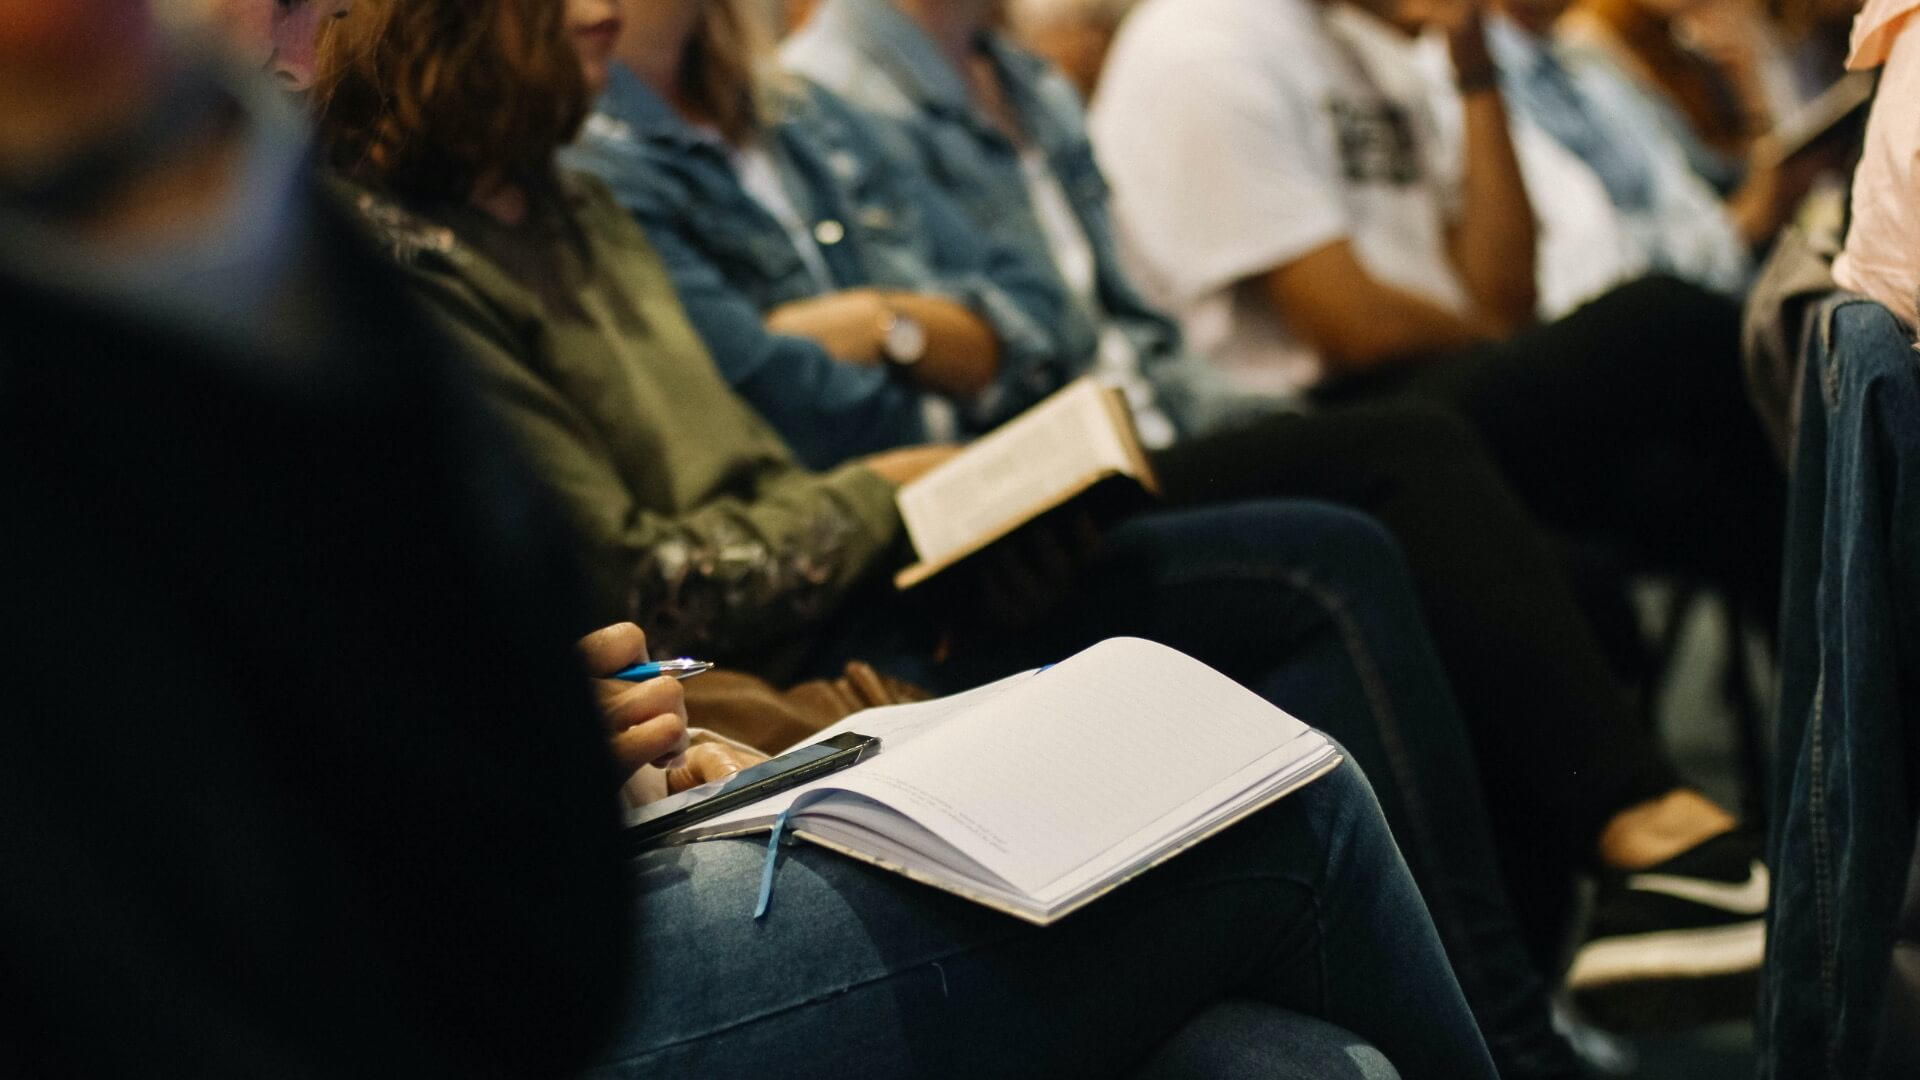 Bibelstudium_Gruppe-mit-Notizen